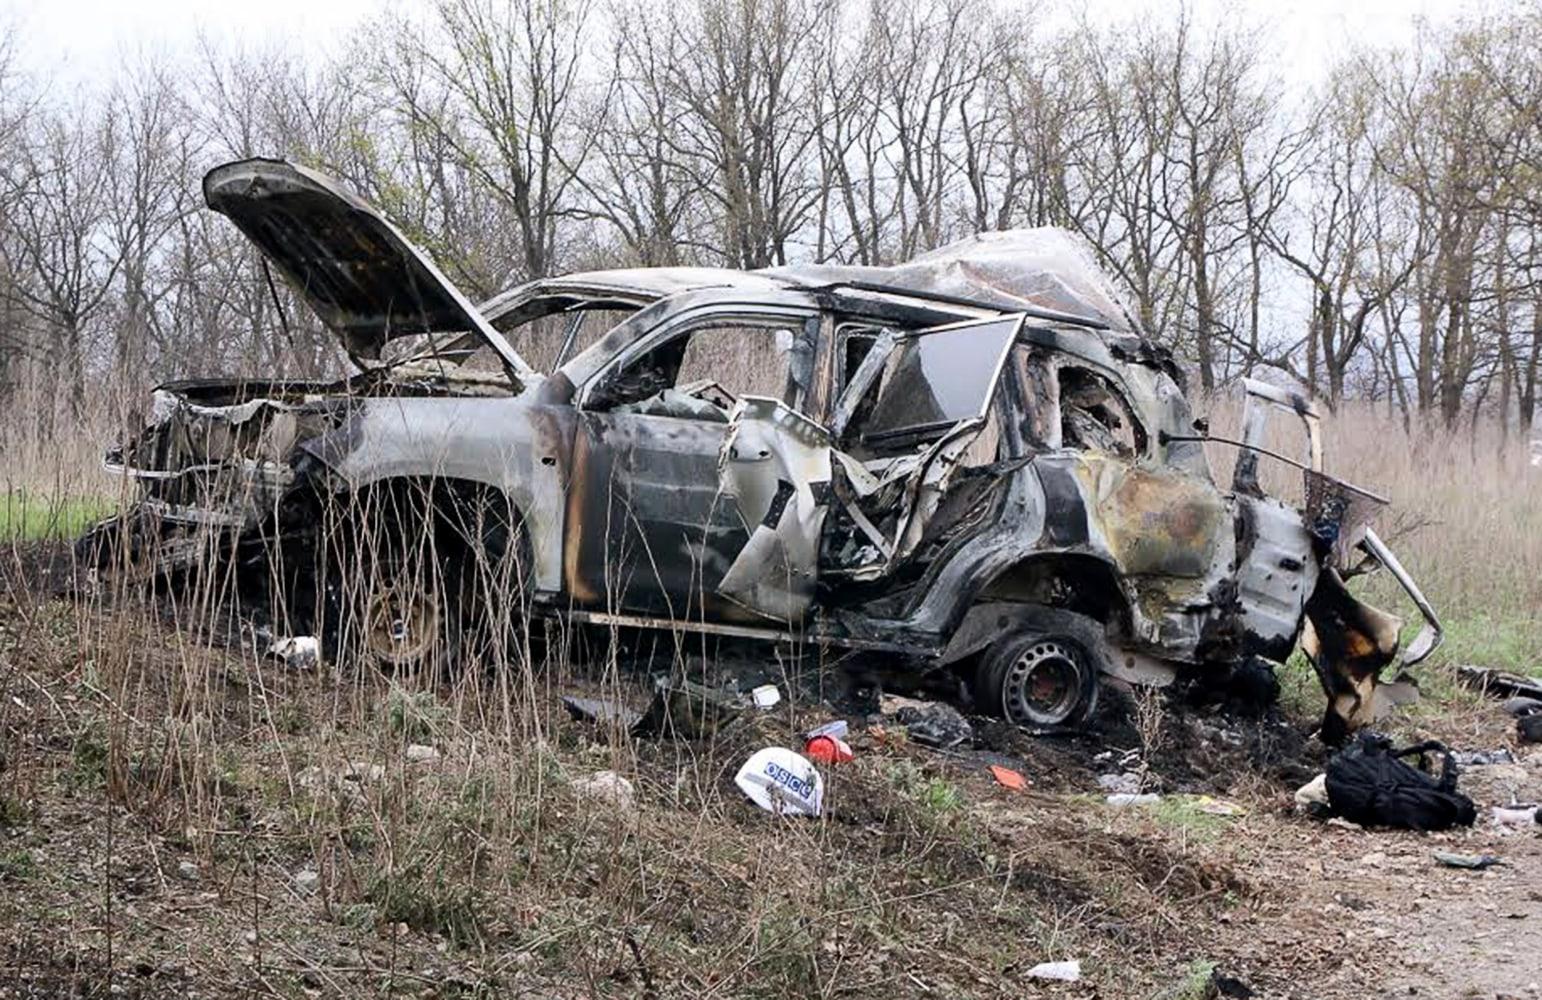 American monitor killed in Ukraine when mine hits vehicle